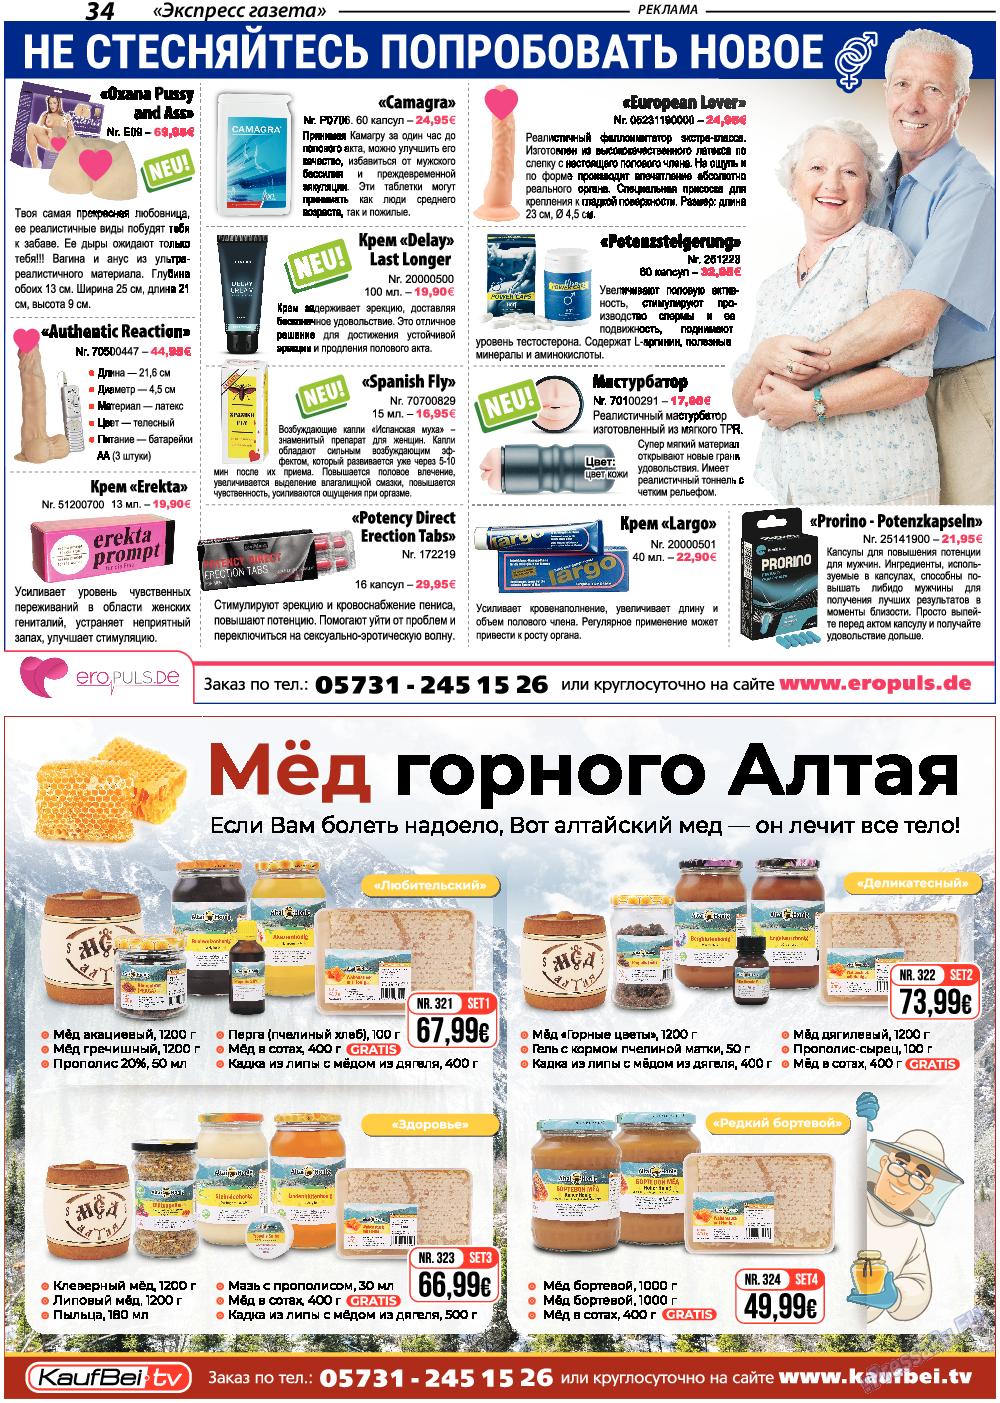 Экспресс газета (газета). 2019 год, номер 6, стр. 34